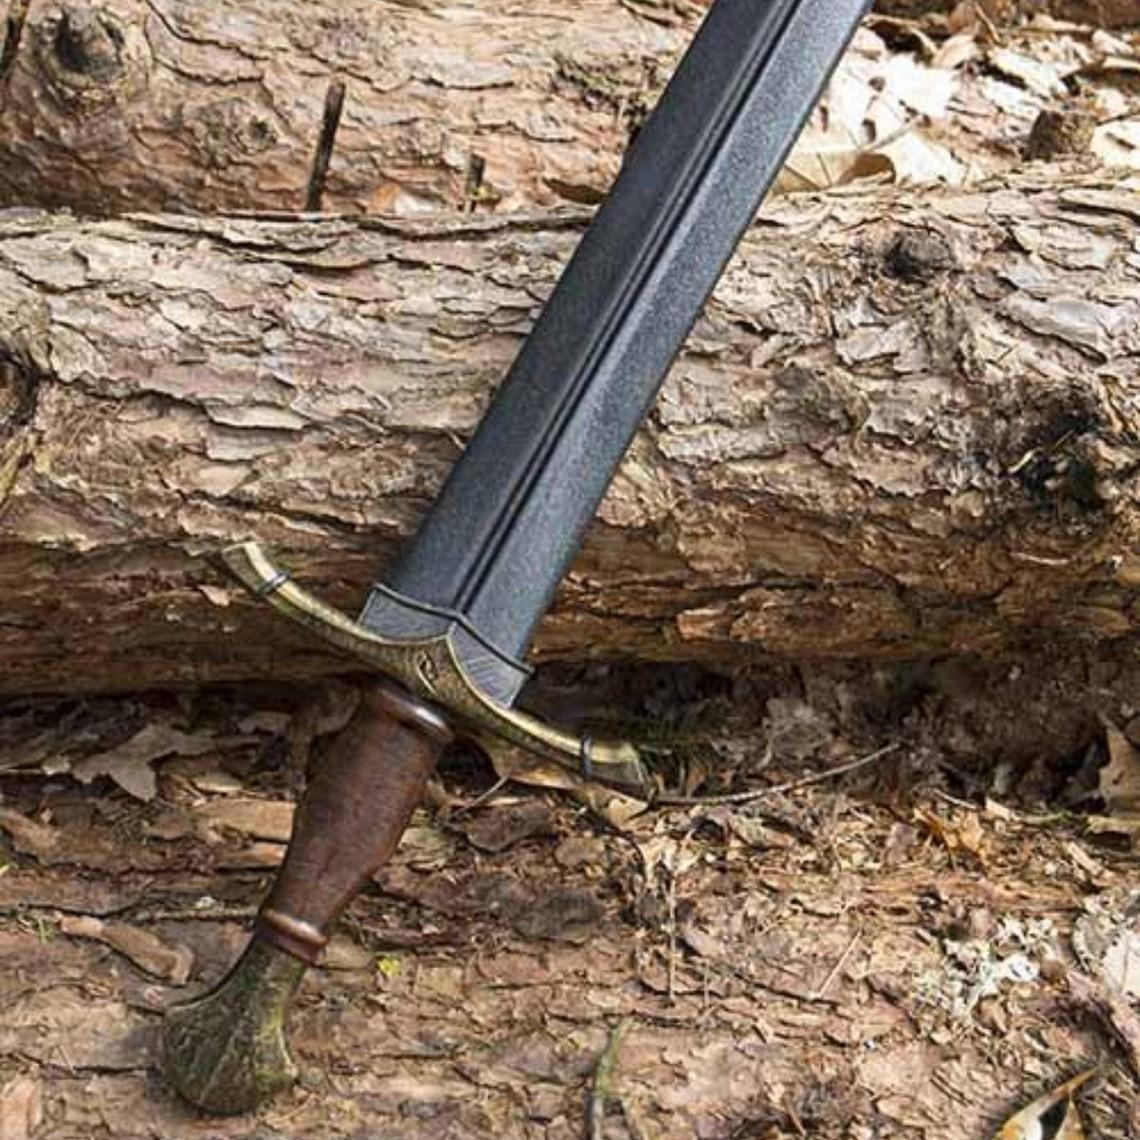 Epic Armoury LARP Ranger zwaard 60 cm